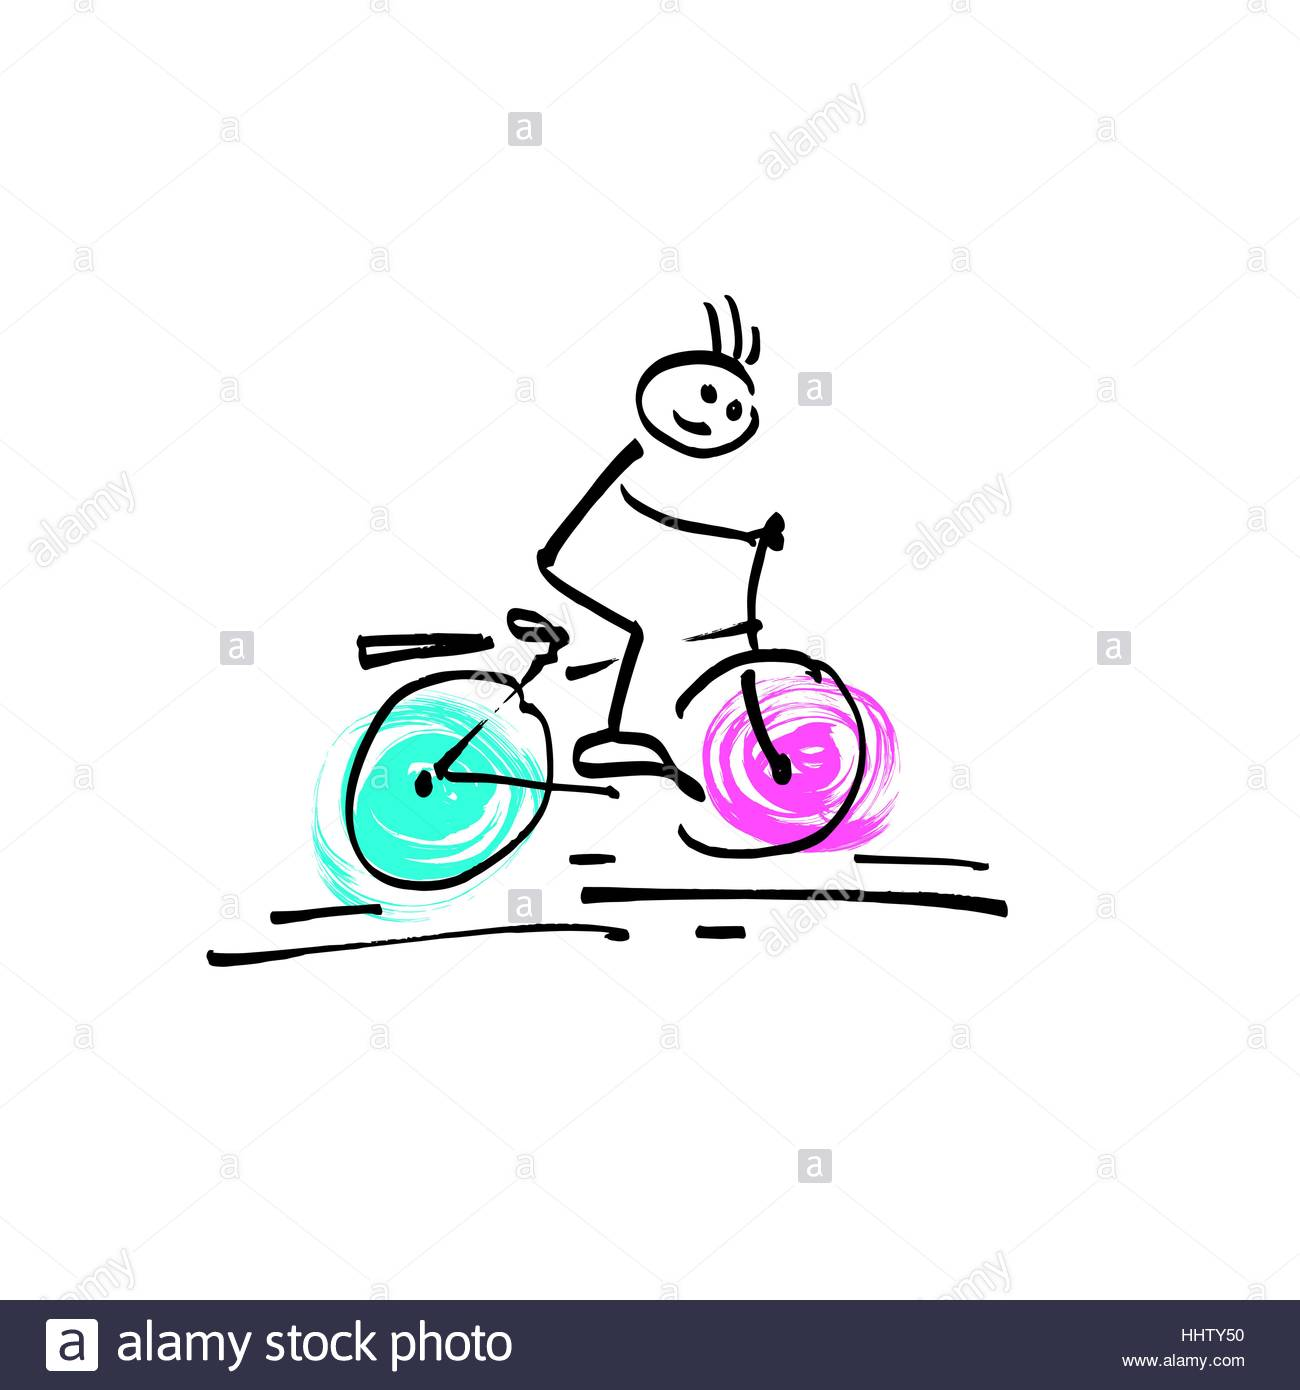 1300x1390 Sketch Doodle Human Stick Figure A Man Riding A Bicycle Stock